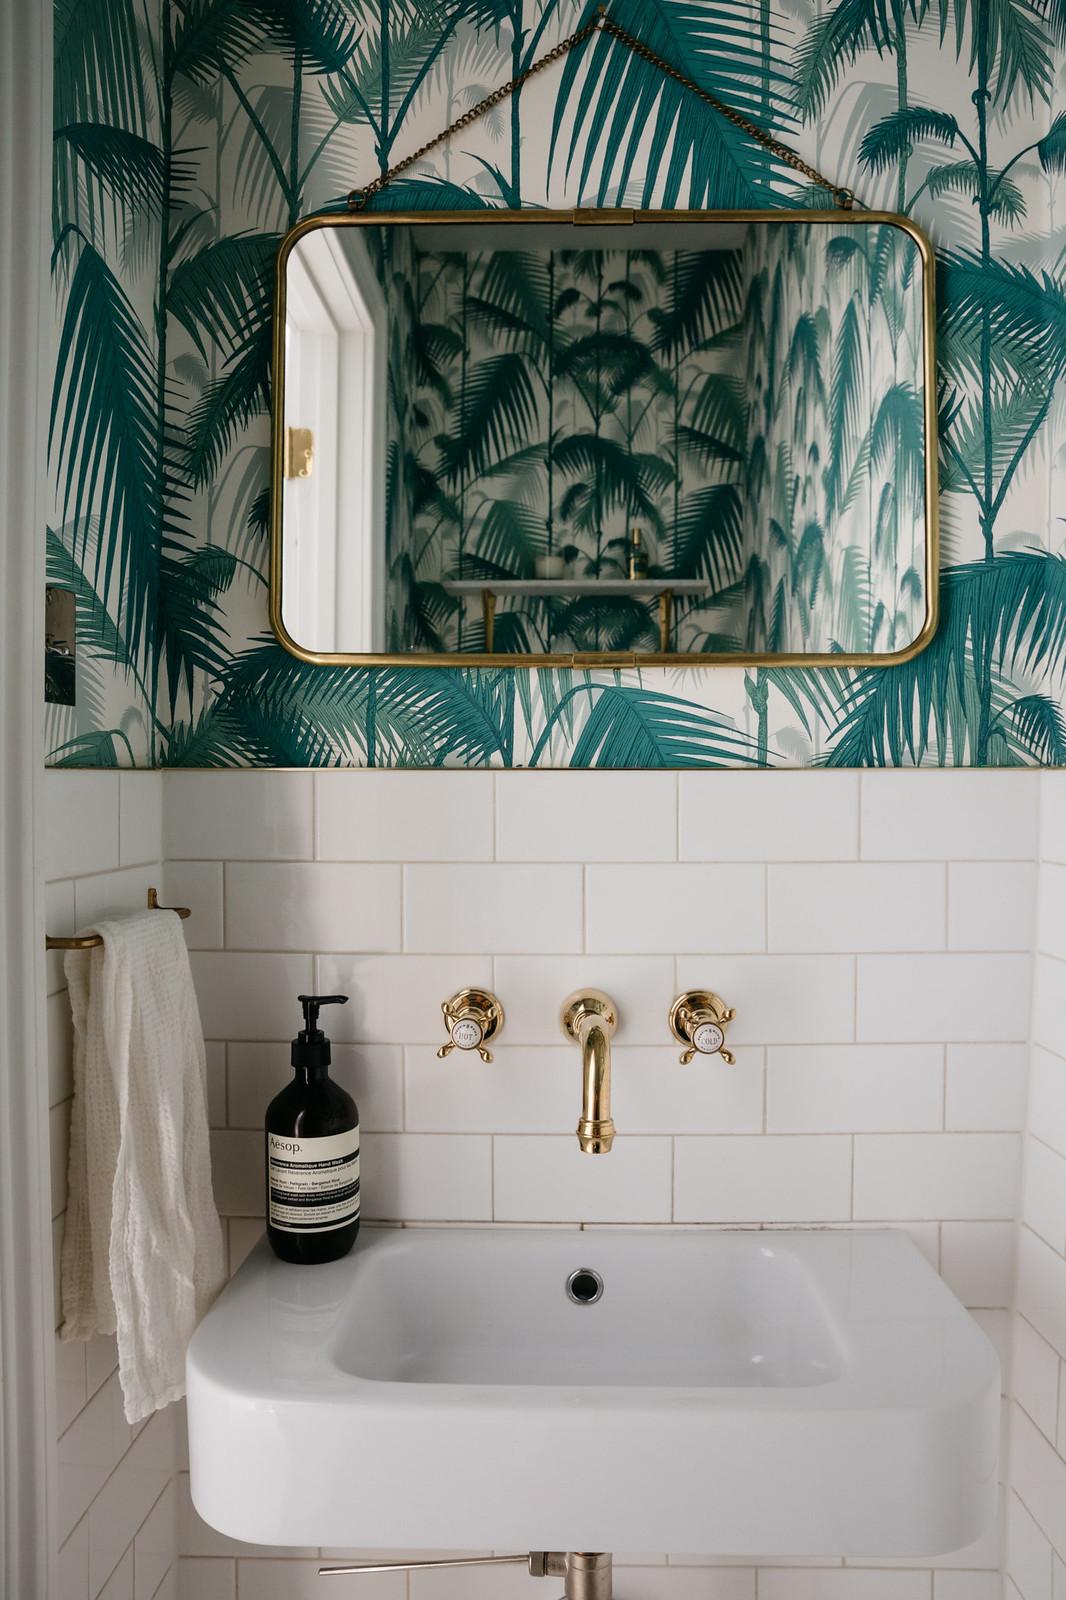 Green Teal Palm Print Wallpaper | California Cool Bathroom Inspiration | Colorful Wallpapered Bathroom | Green Powder Room Ideas | Gold and Green Bathroom